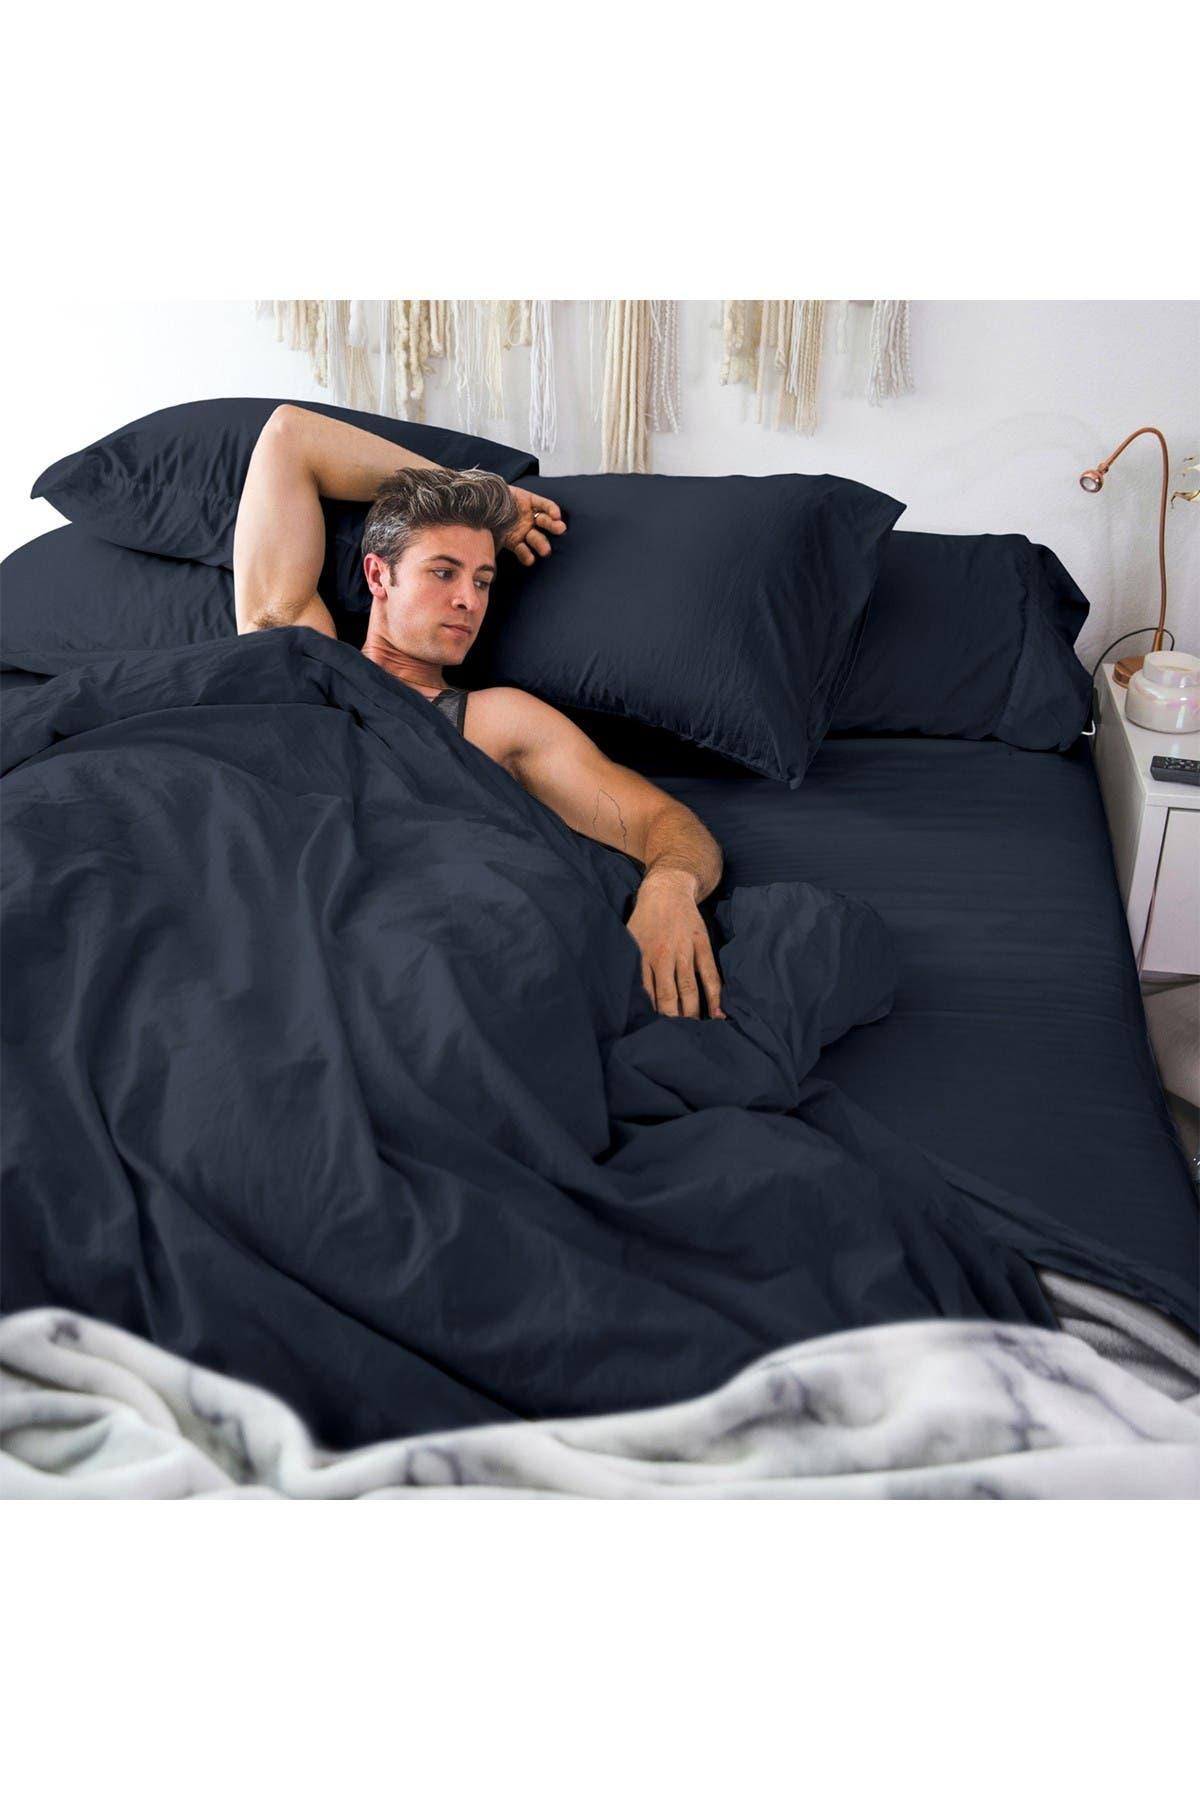 Image of Pillow Guy Classic Cool & Crisp Cotton Percale 4-Piece Sheet Set - Dark Navy  - Cal King Size